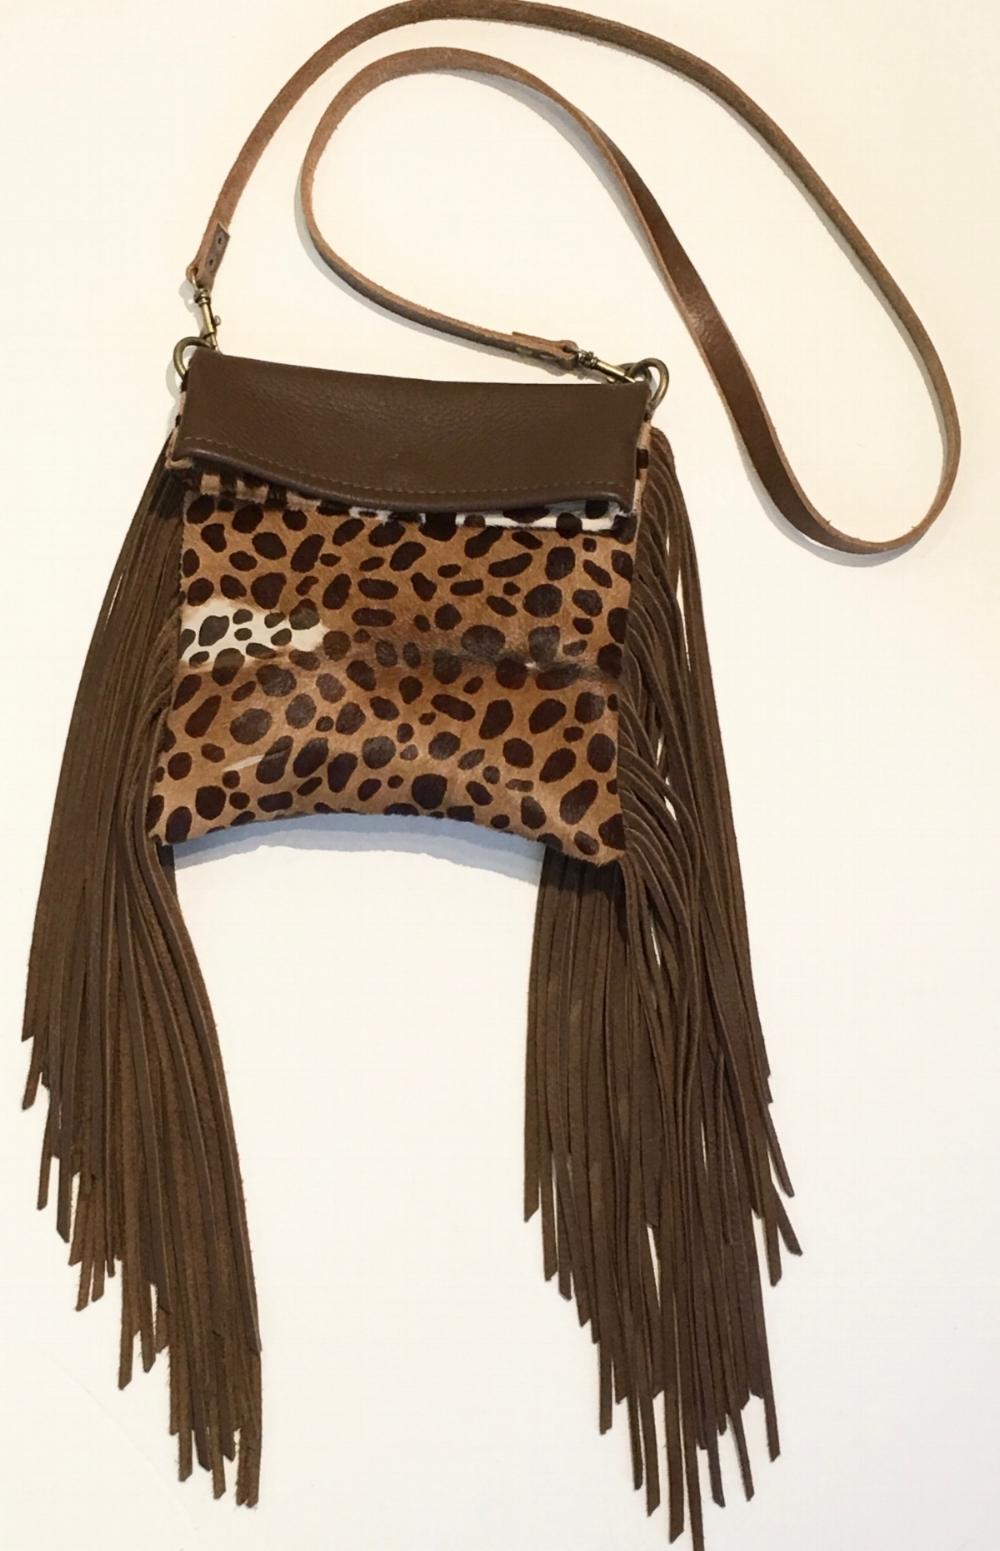 Reversible one side soft brown deerskin, the other hair on hide Handbag with long strap.  Lambskin fringe and magnet closure.  $380., .jpg